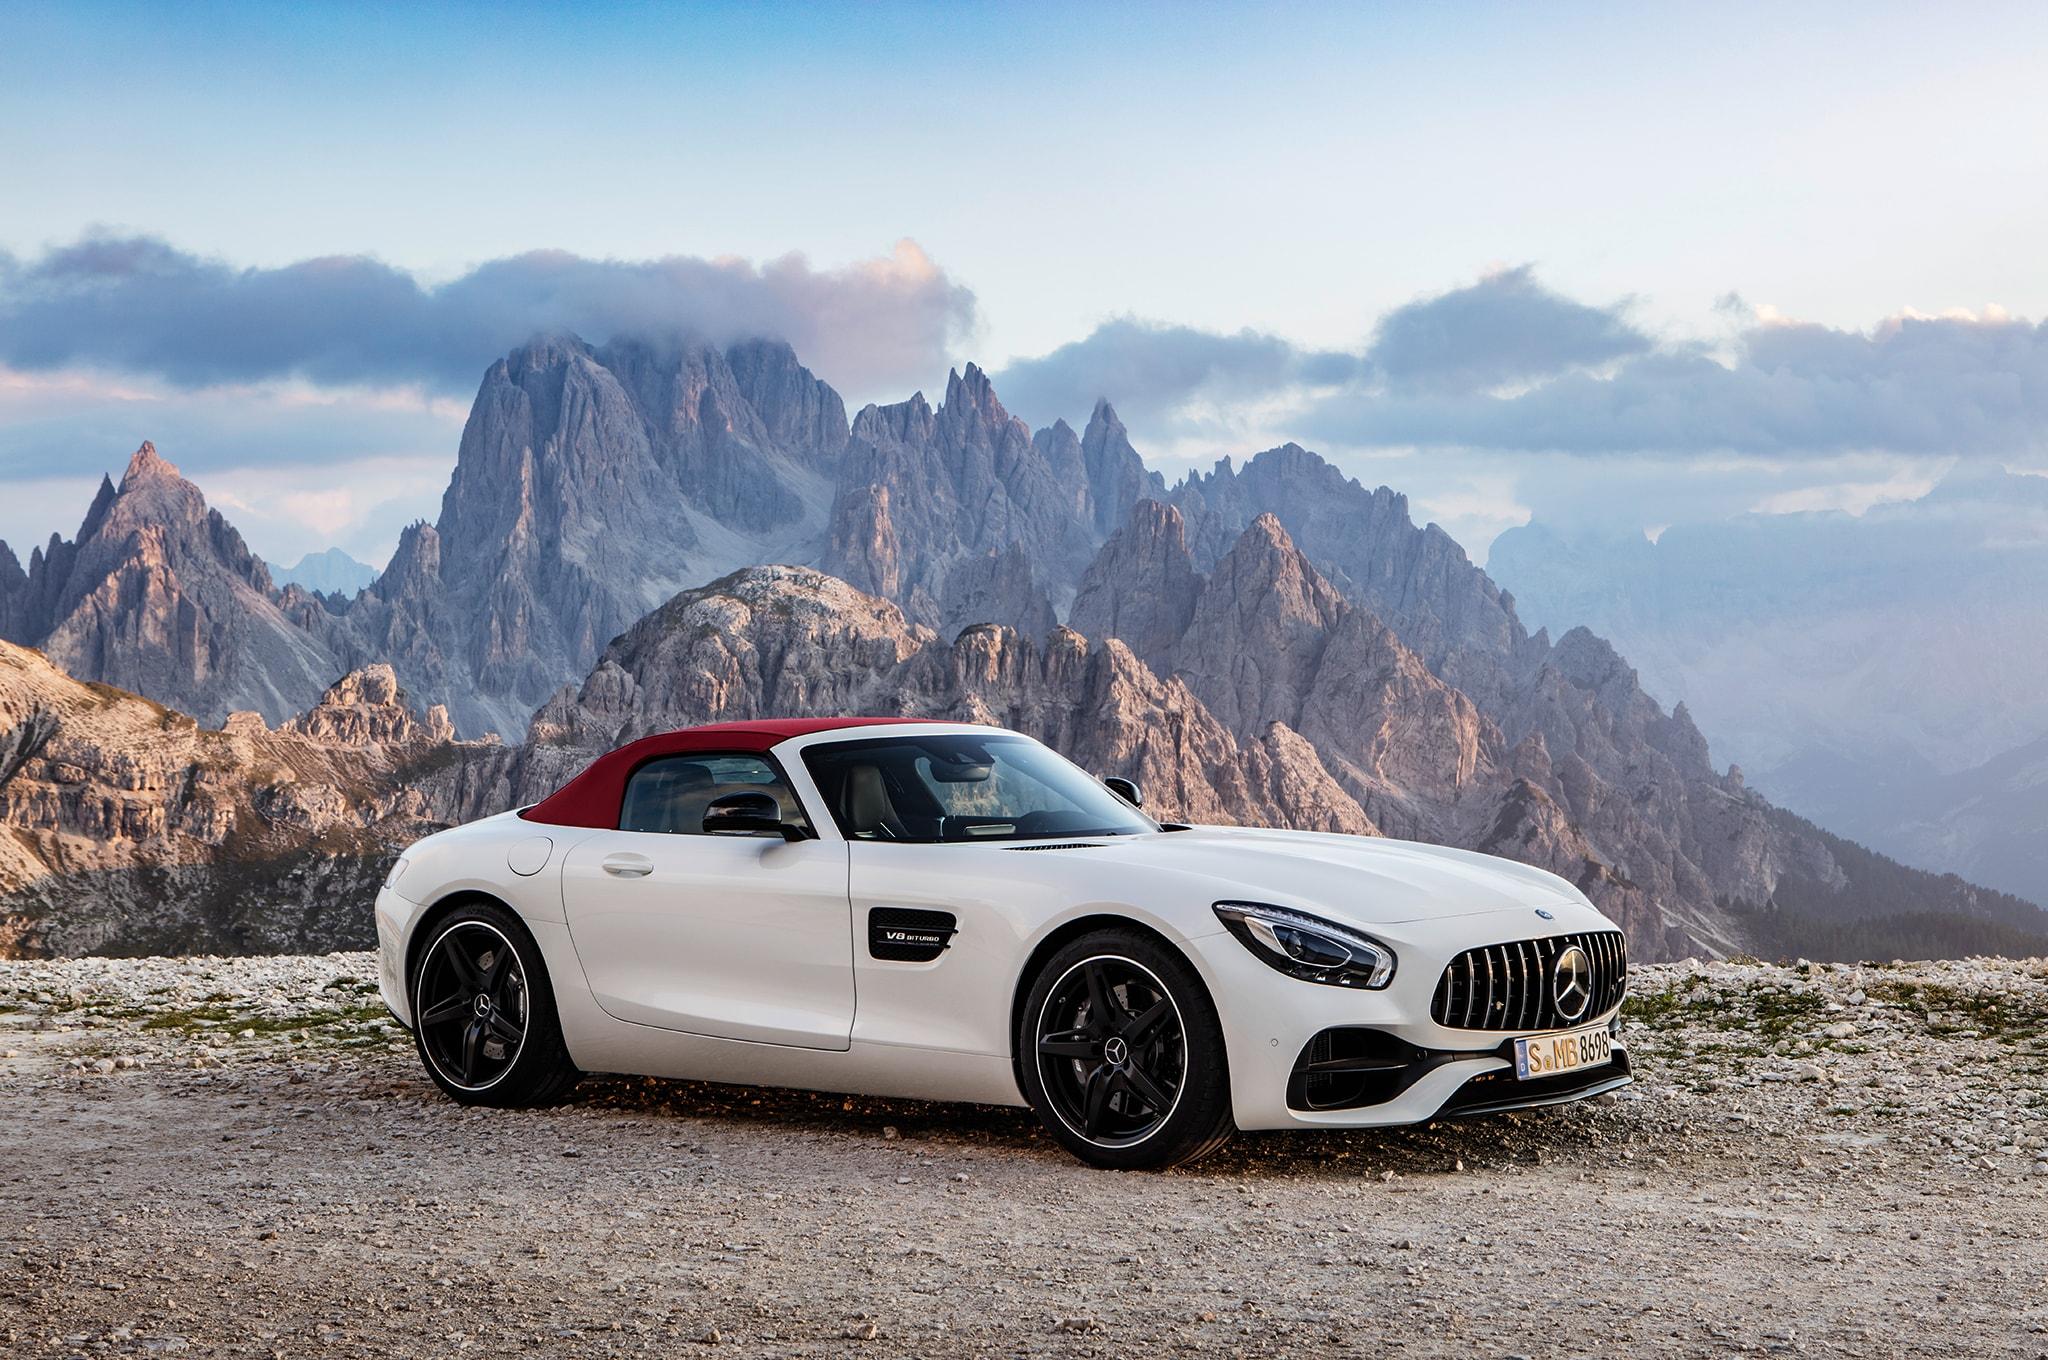 Mercedes-AMG GT Roadster Desktop wallpapers